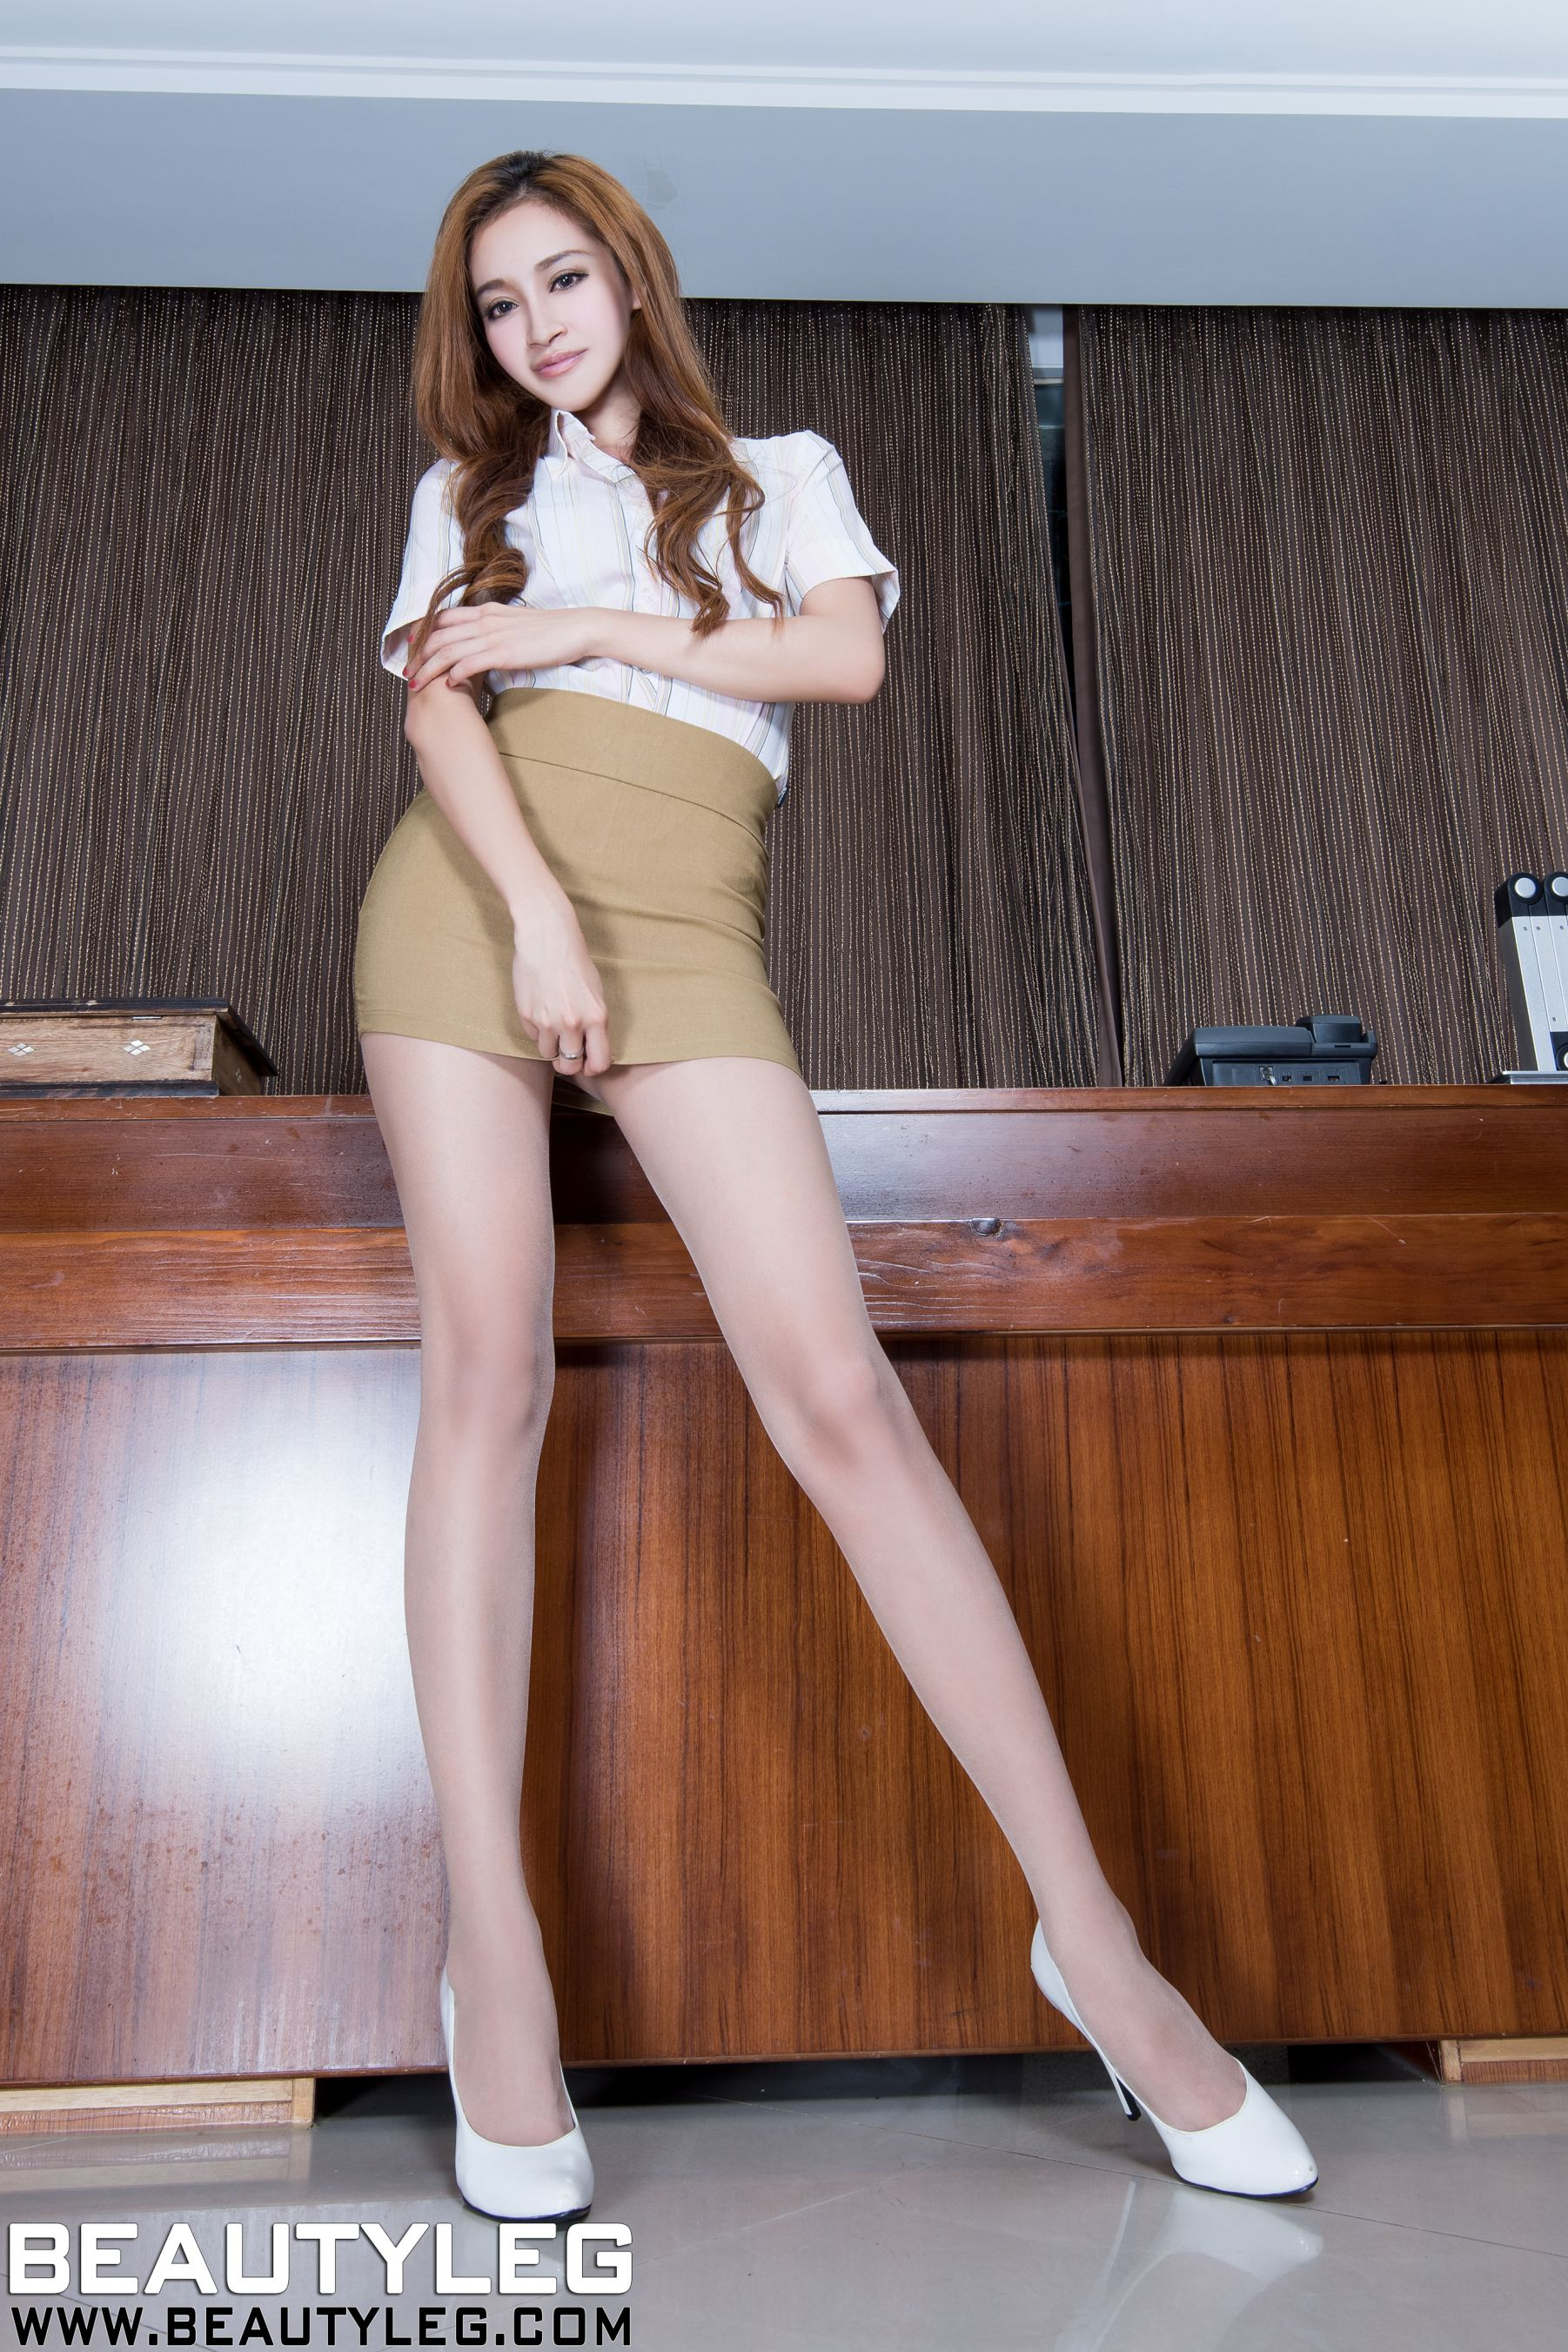 VOL.909 [Beautyleg]高跟美腿:詹艾葳(腿模Avril,腿模Arvil)高品质写真套图(59P)